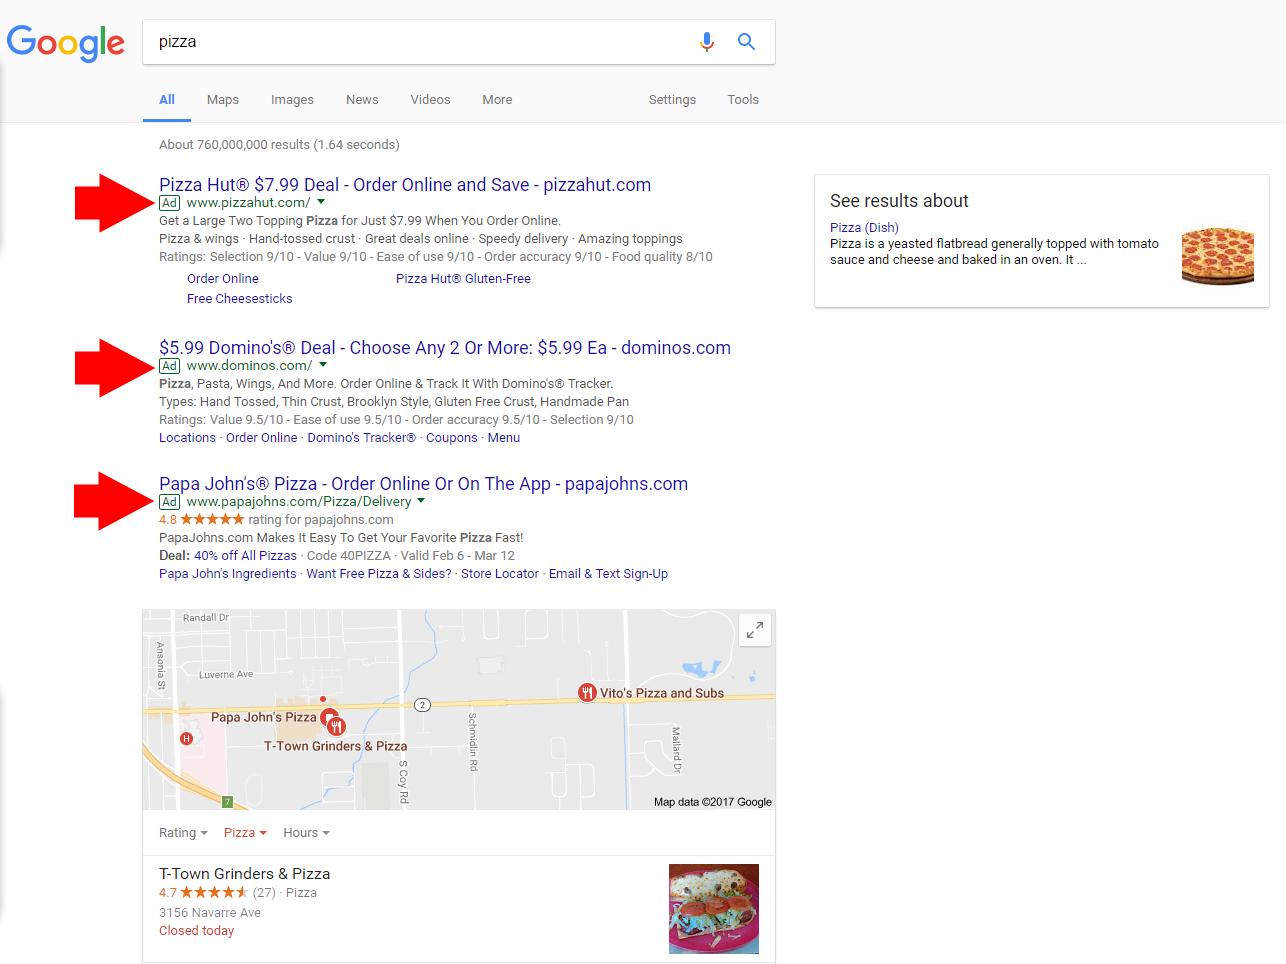 Google Advertising 1 ABC Advertising Agency | Digital Marketing Specialists | Toledo, Ohio